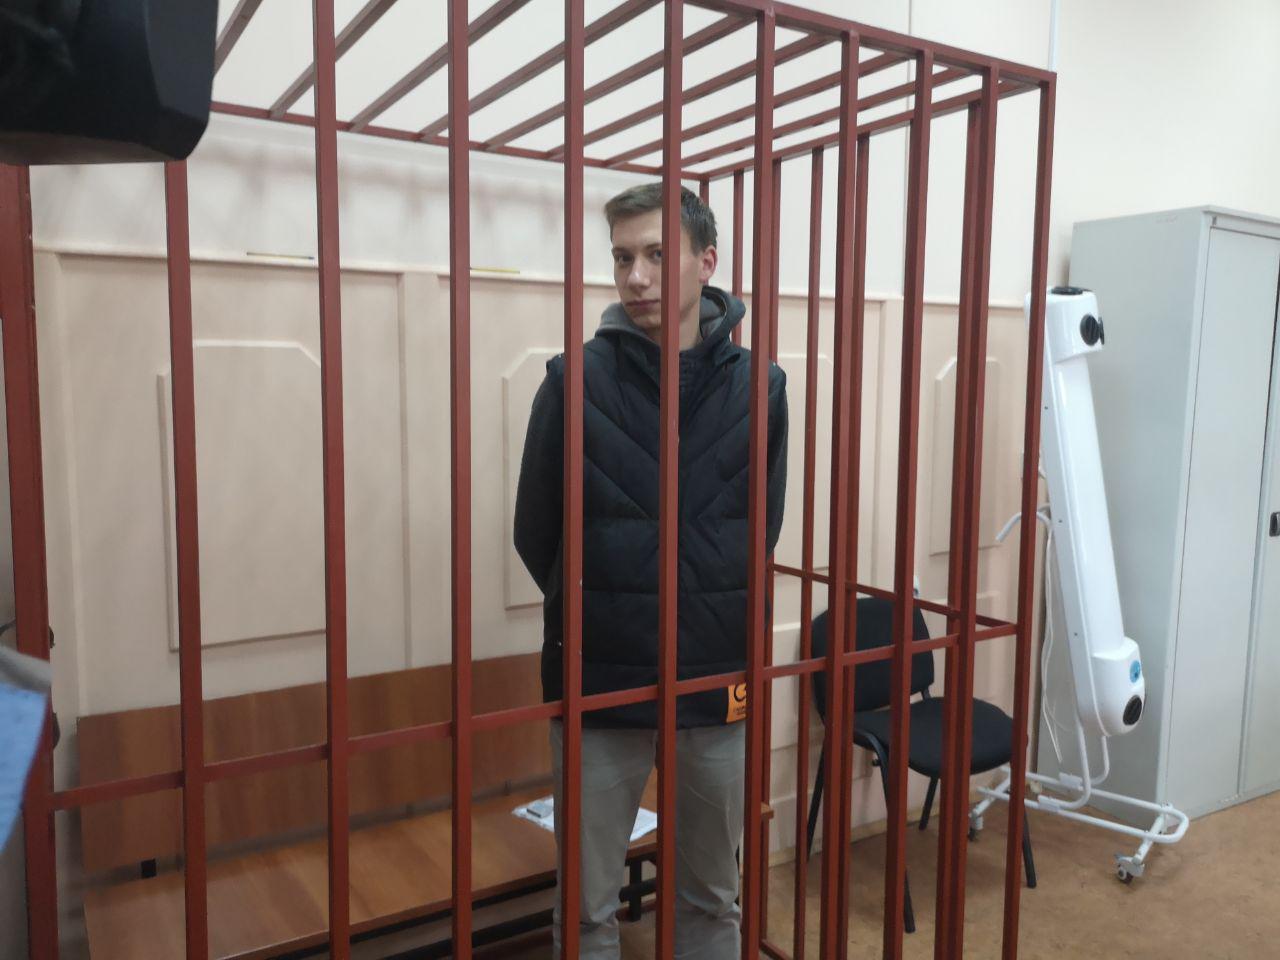 Валерий Костенок в Басманном суде. Фото: Анна Козкина